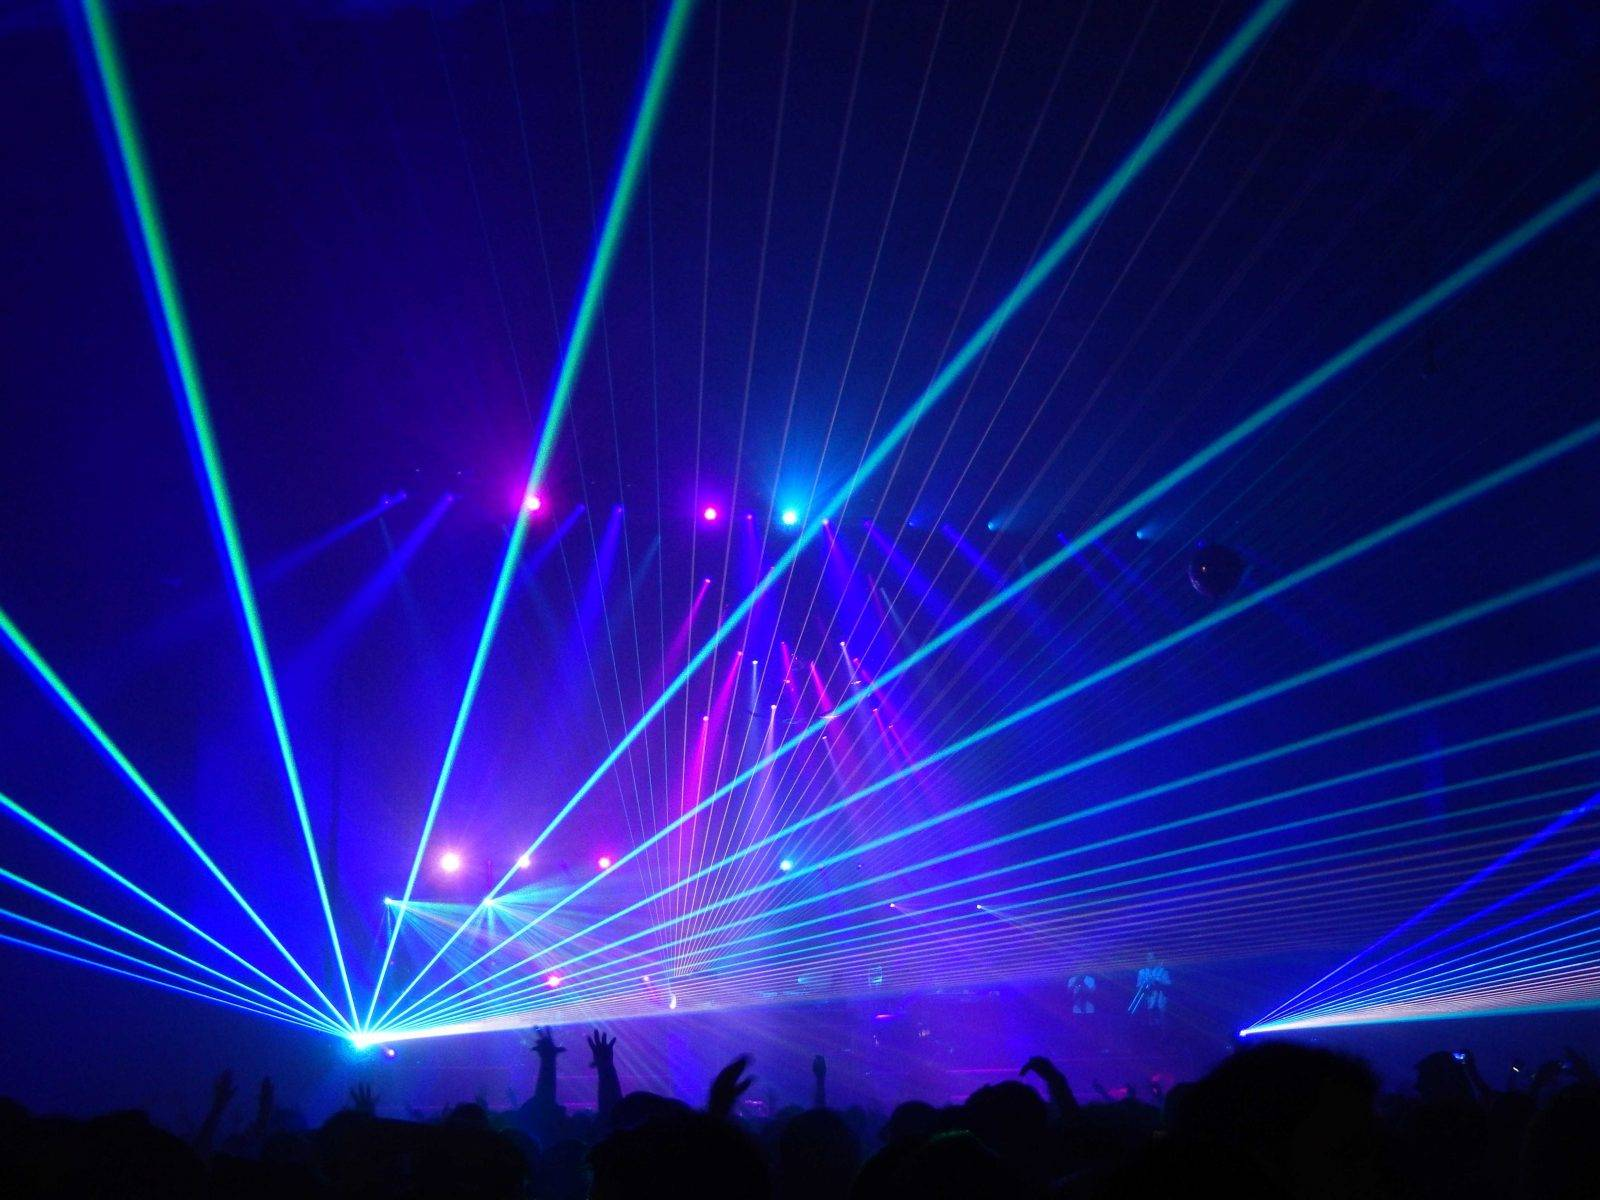 laser light show - photo #45